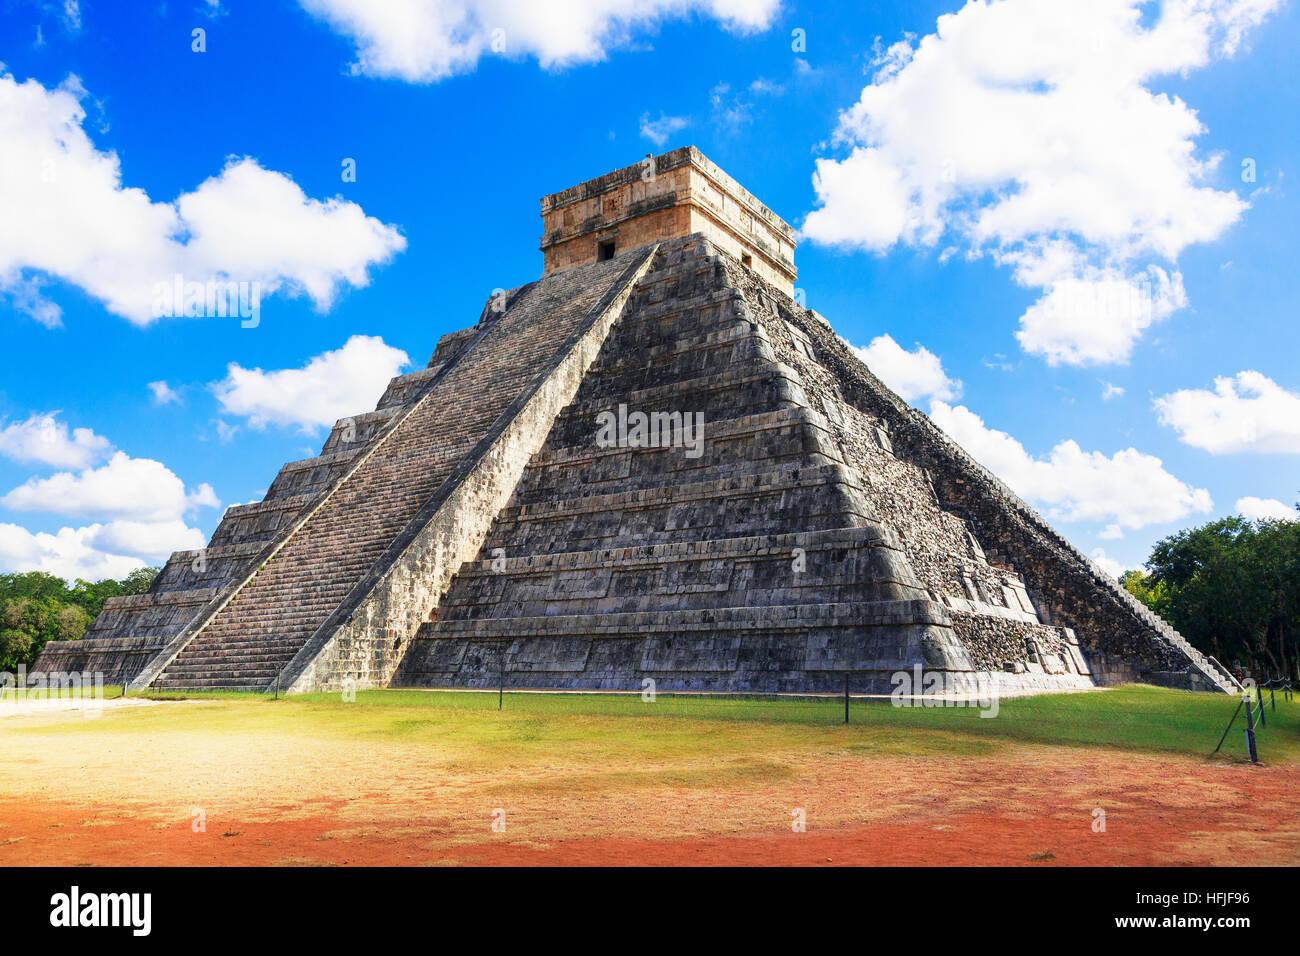 Central structure of Castillo, in the ancient Mayan temple of Chichen Itza, Yucatan, mexico - Stock Image